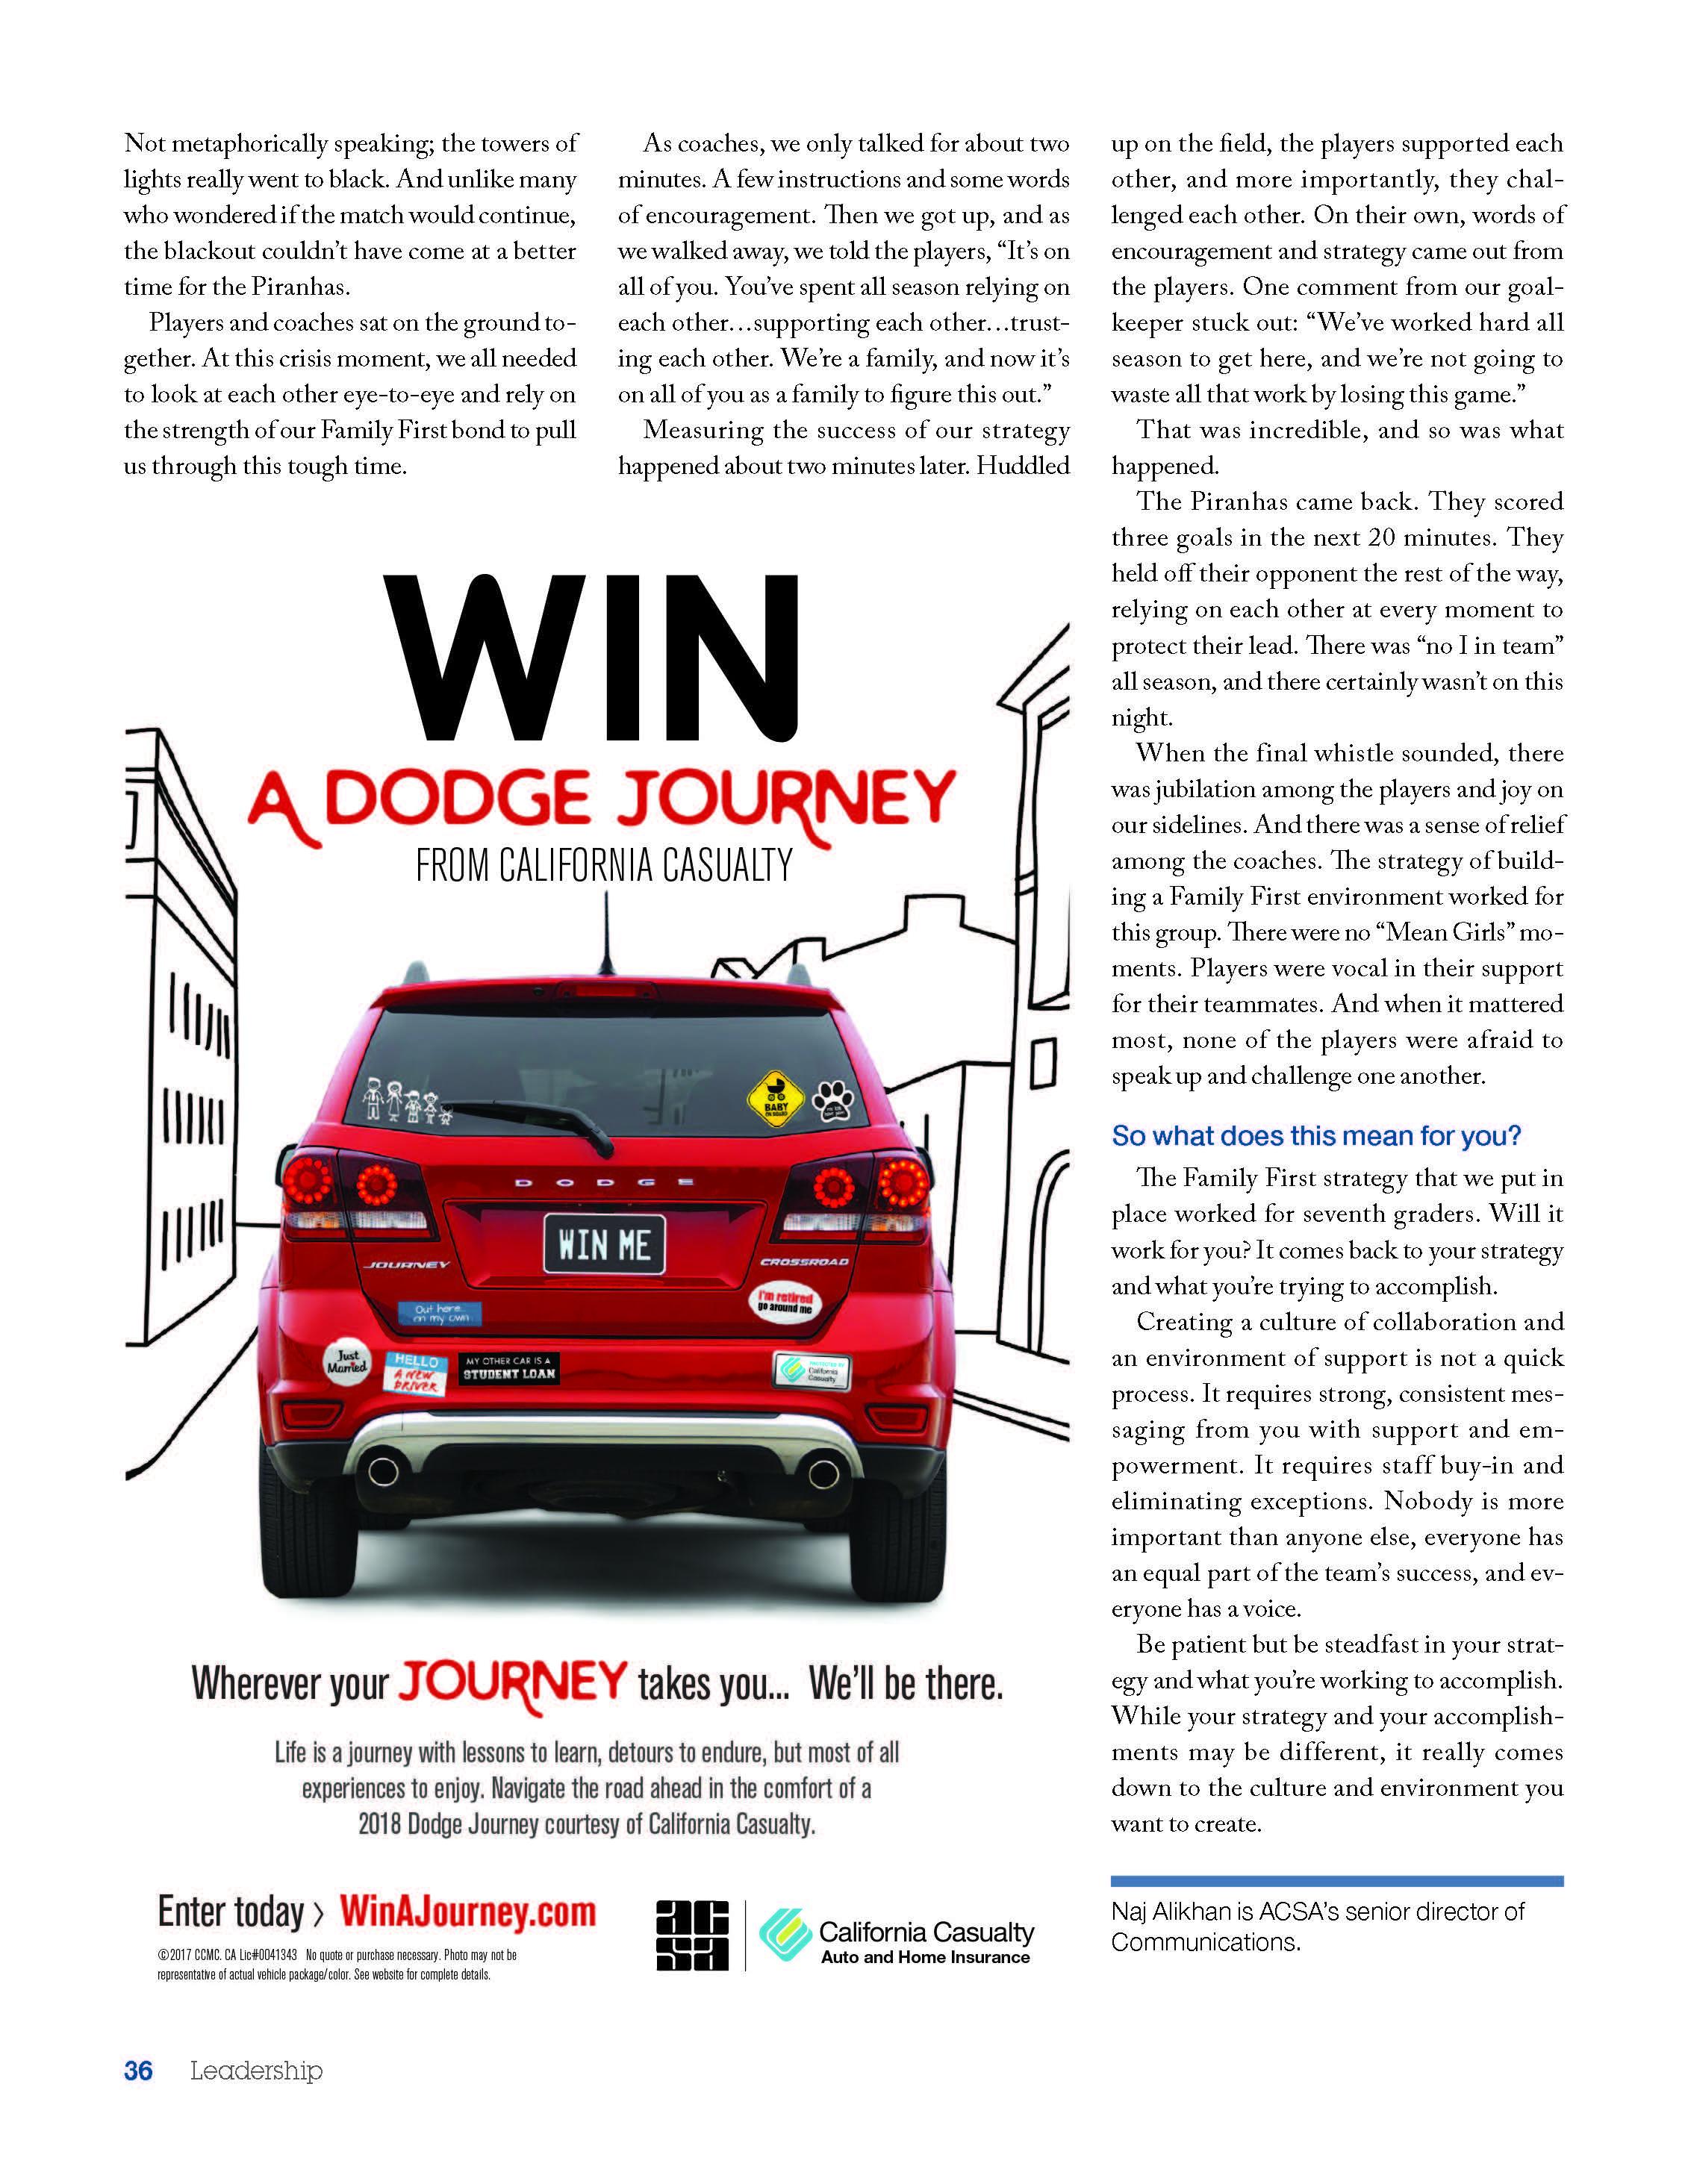 leadership magazine-volume 47; page three of three